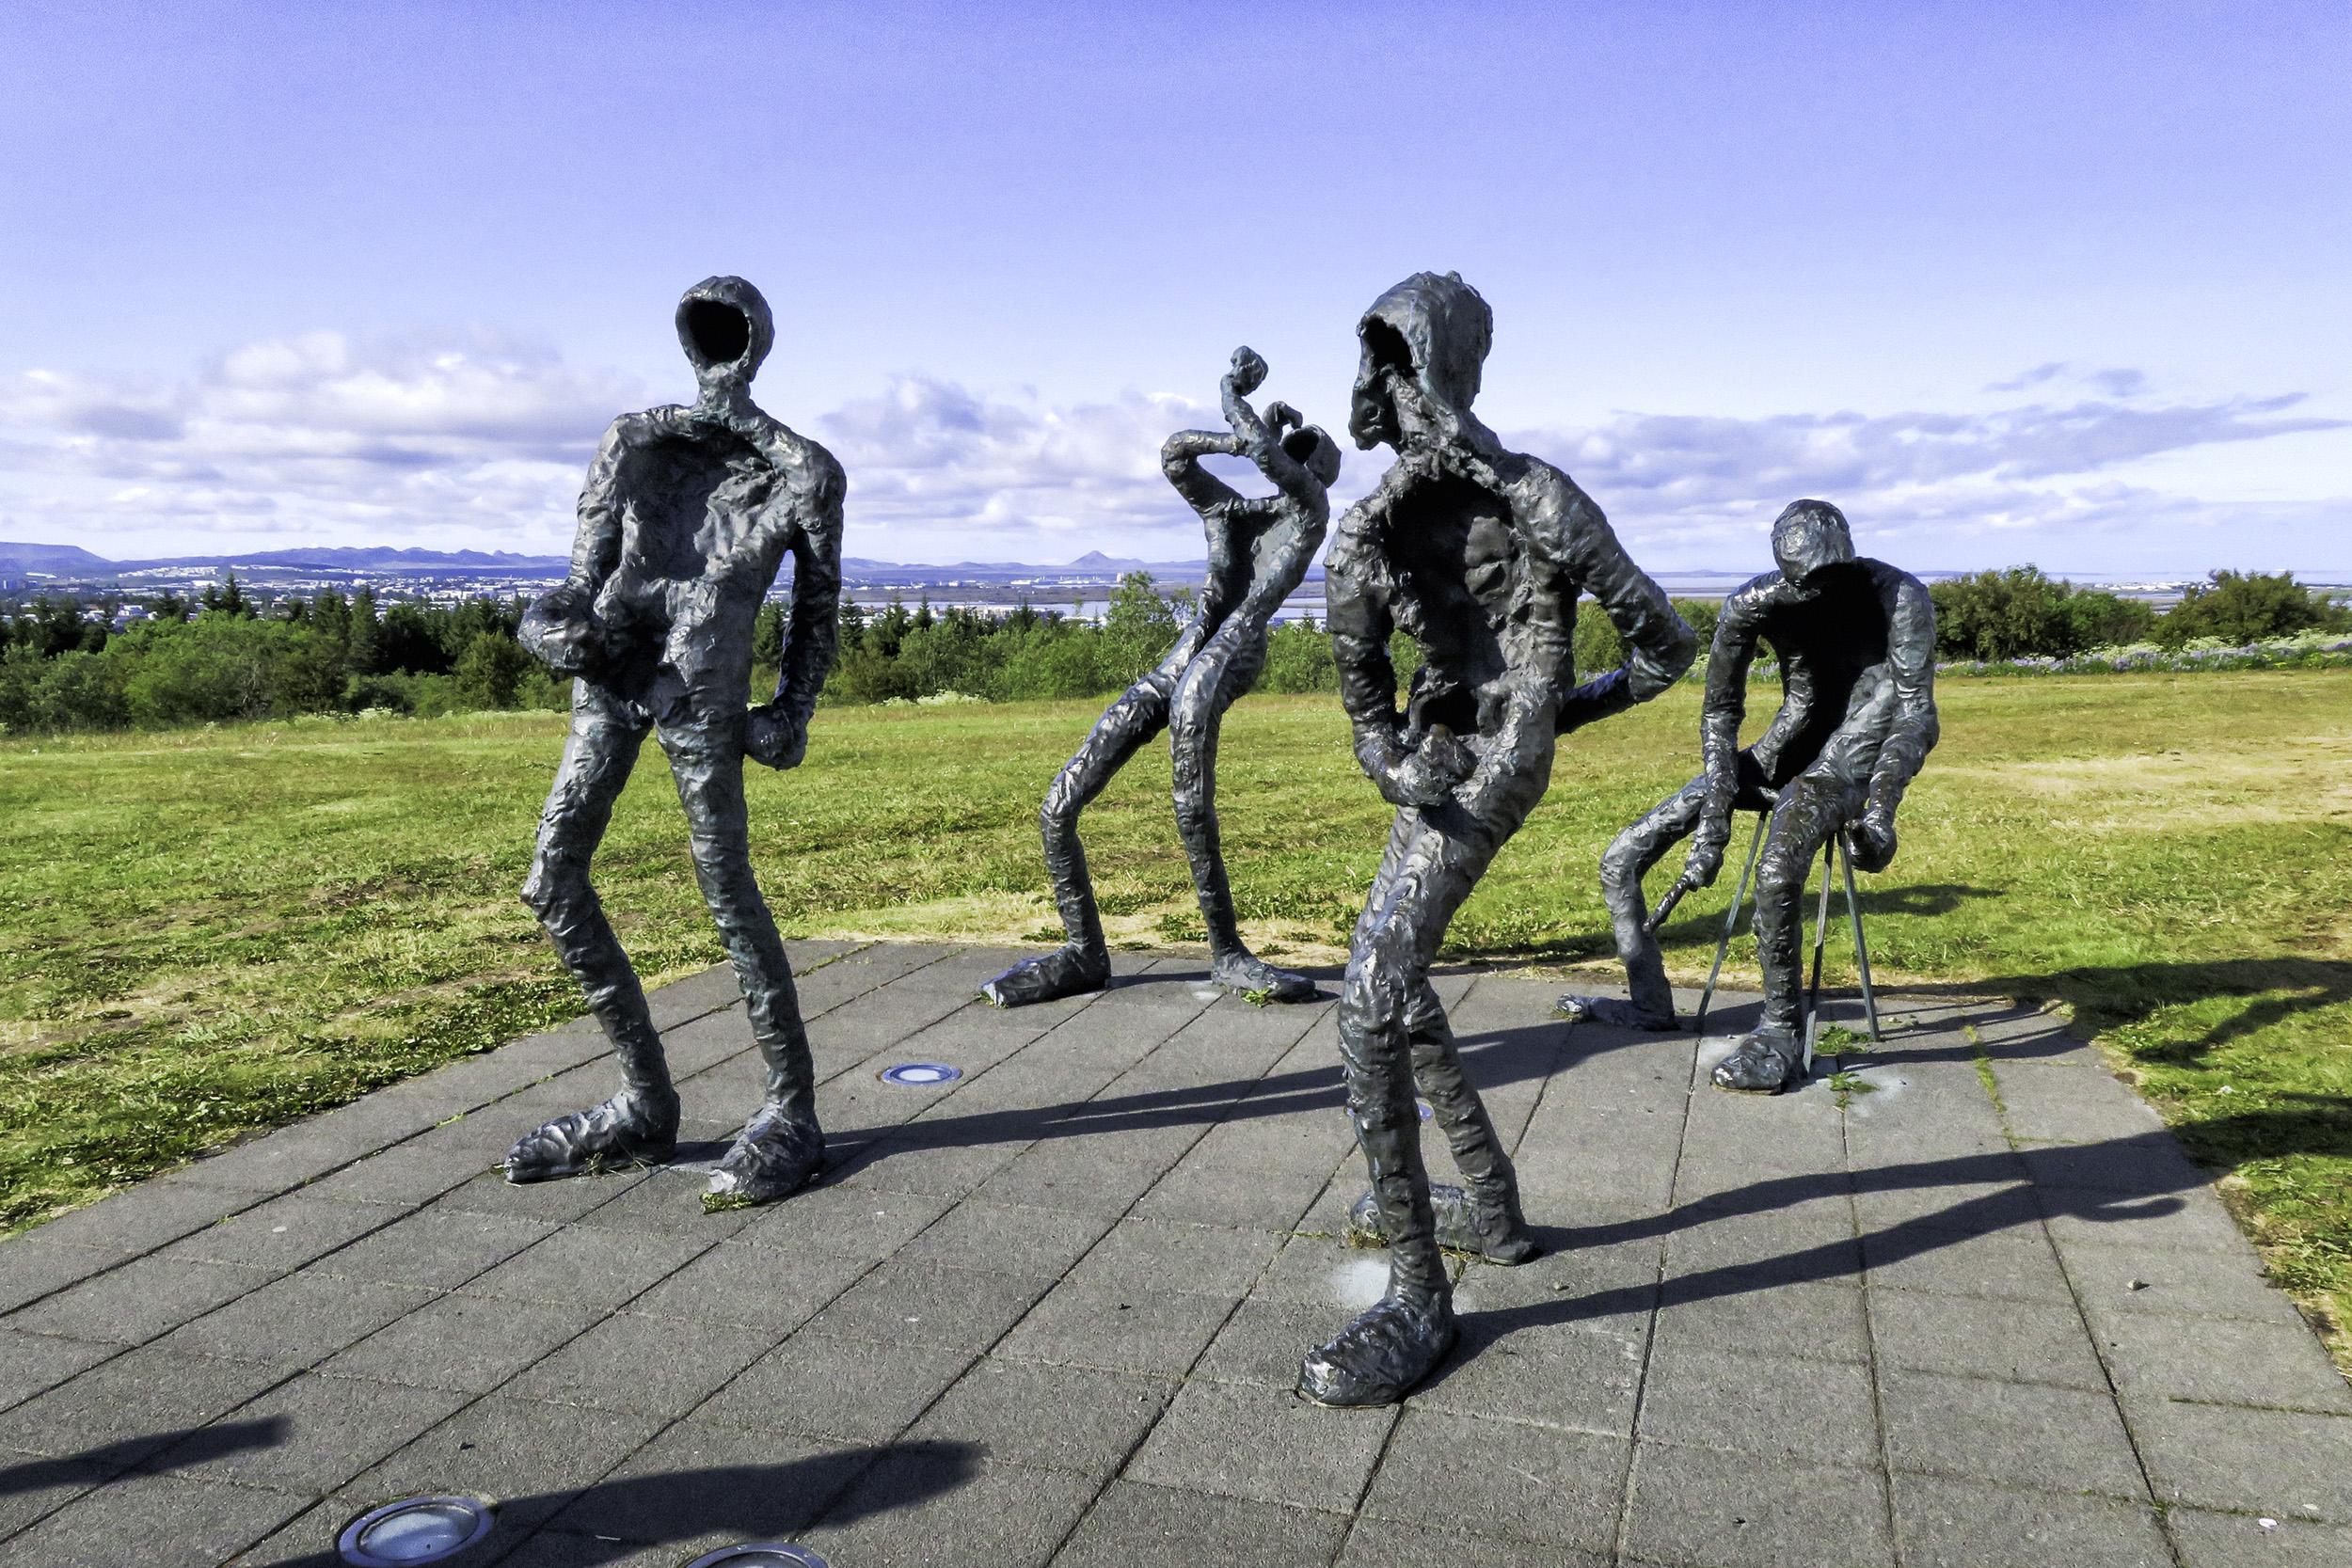 Dansleikur (Dance) sculptures outside the Perlan